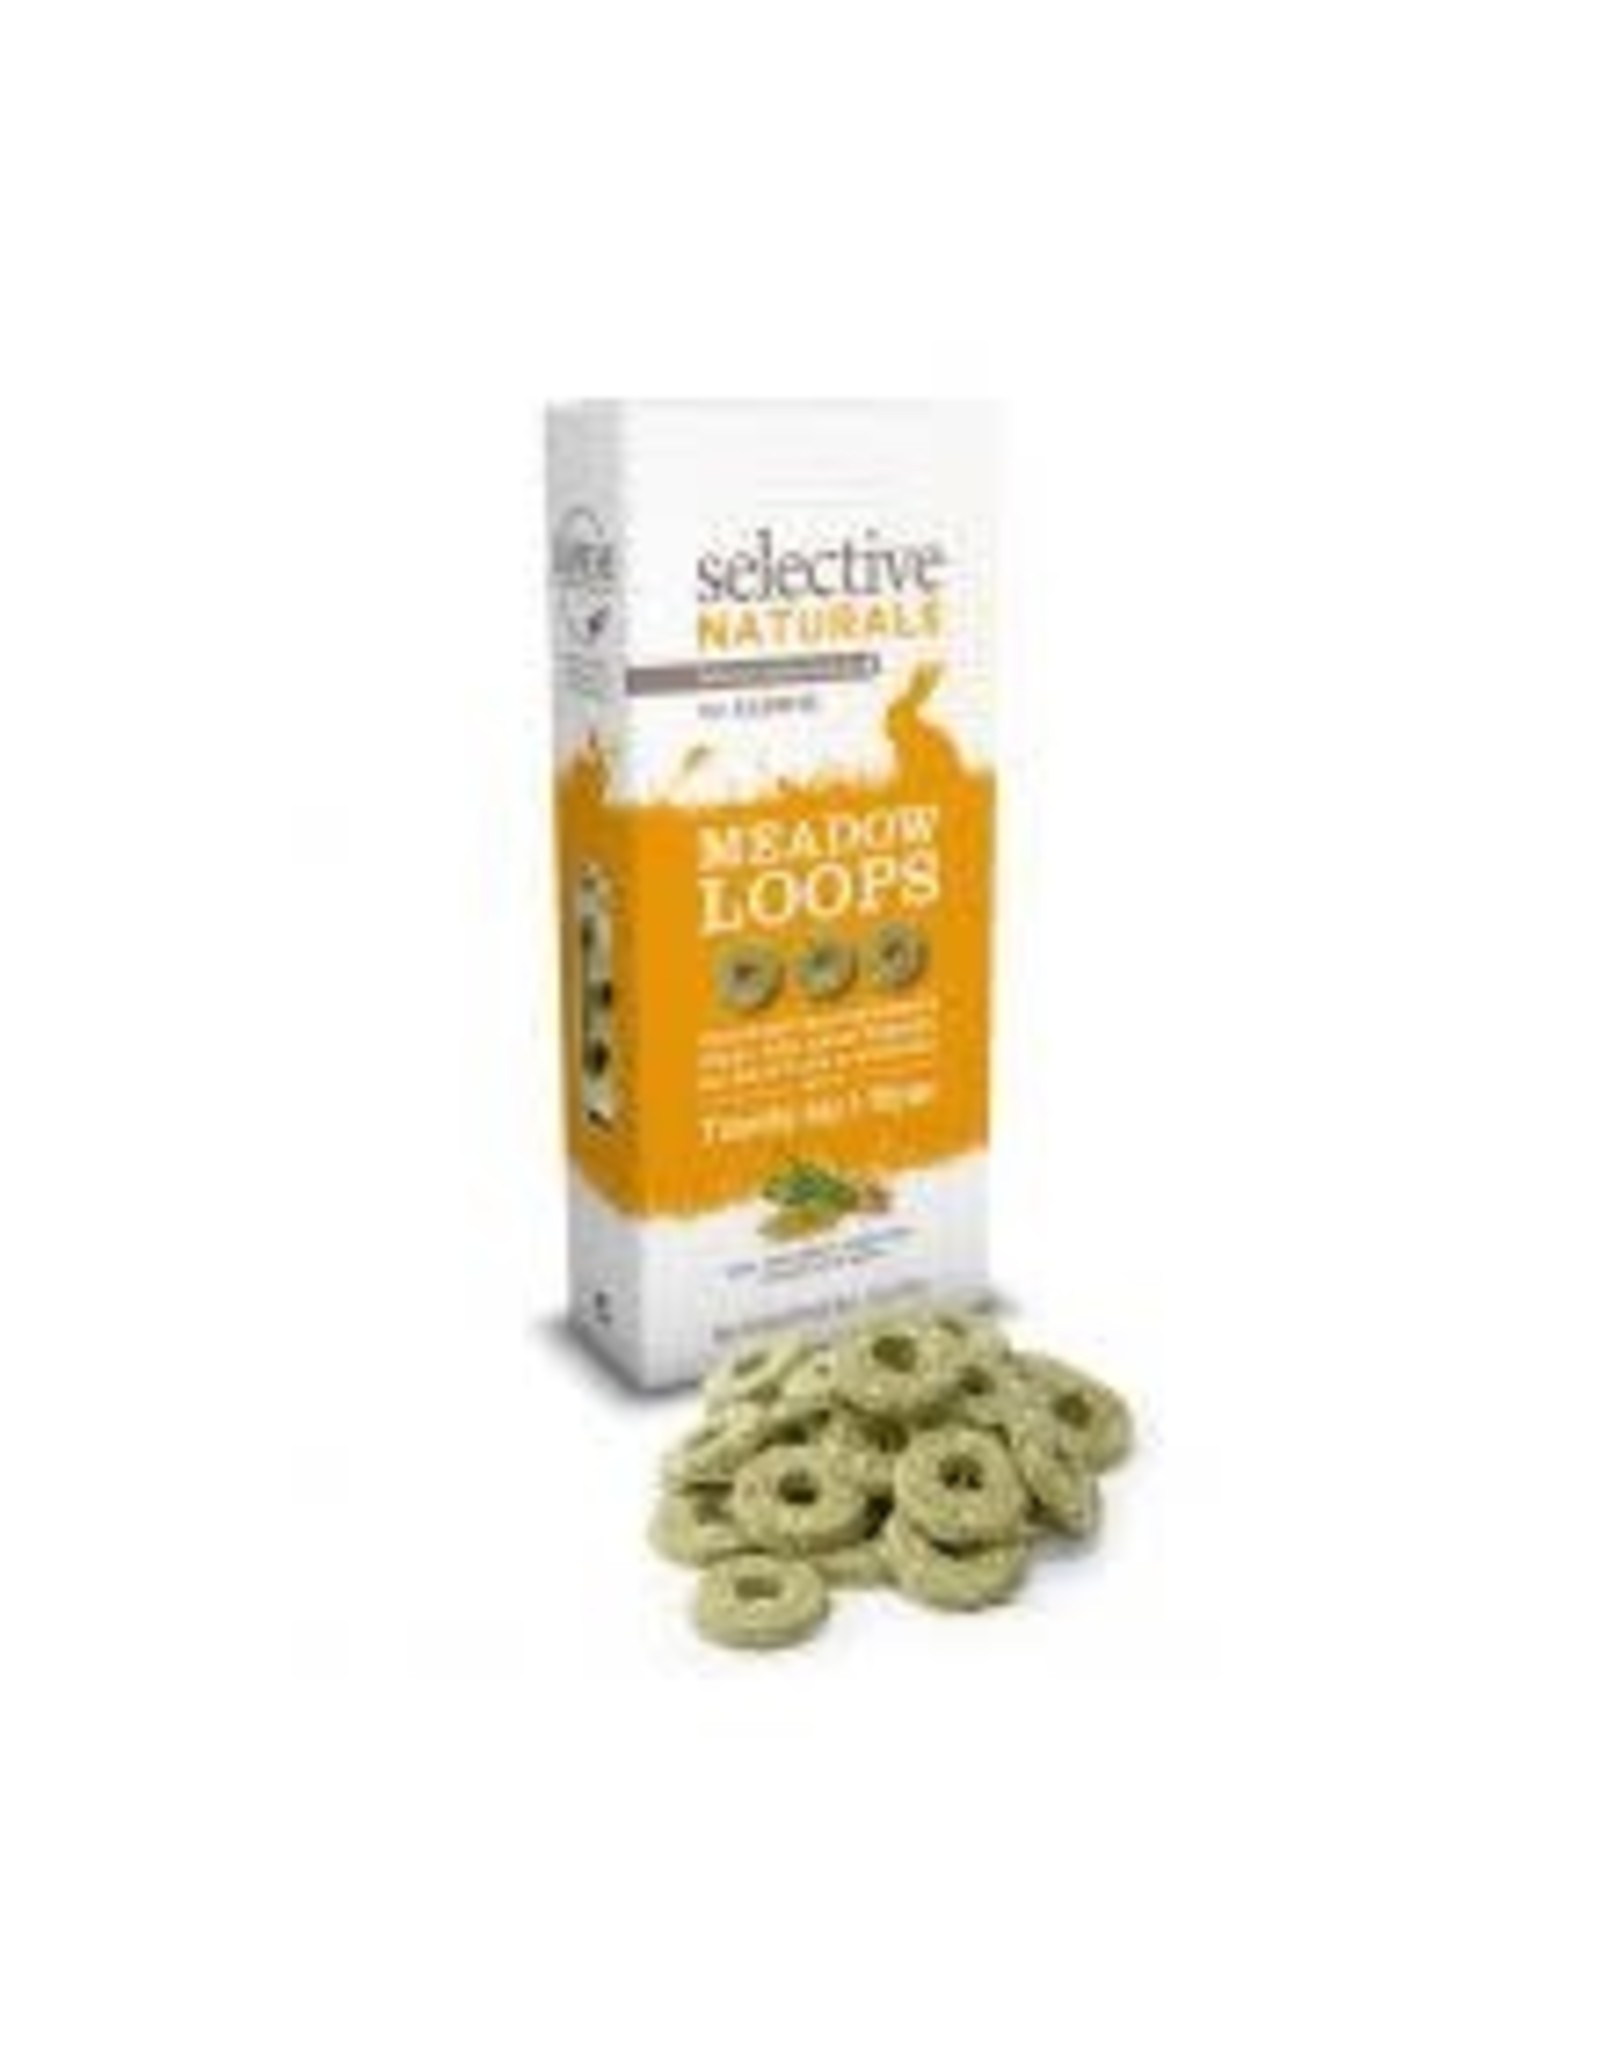 Selective Selective Naturals Meadow Loops 80g